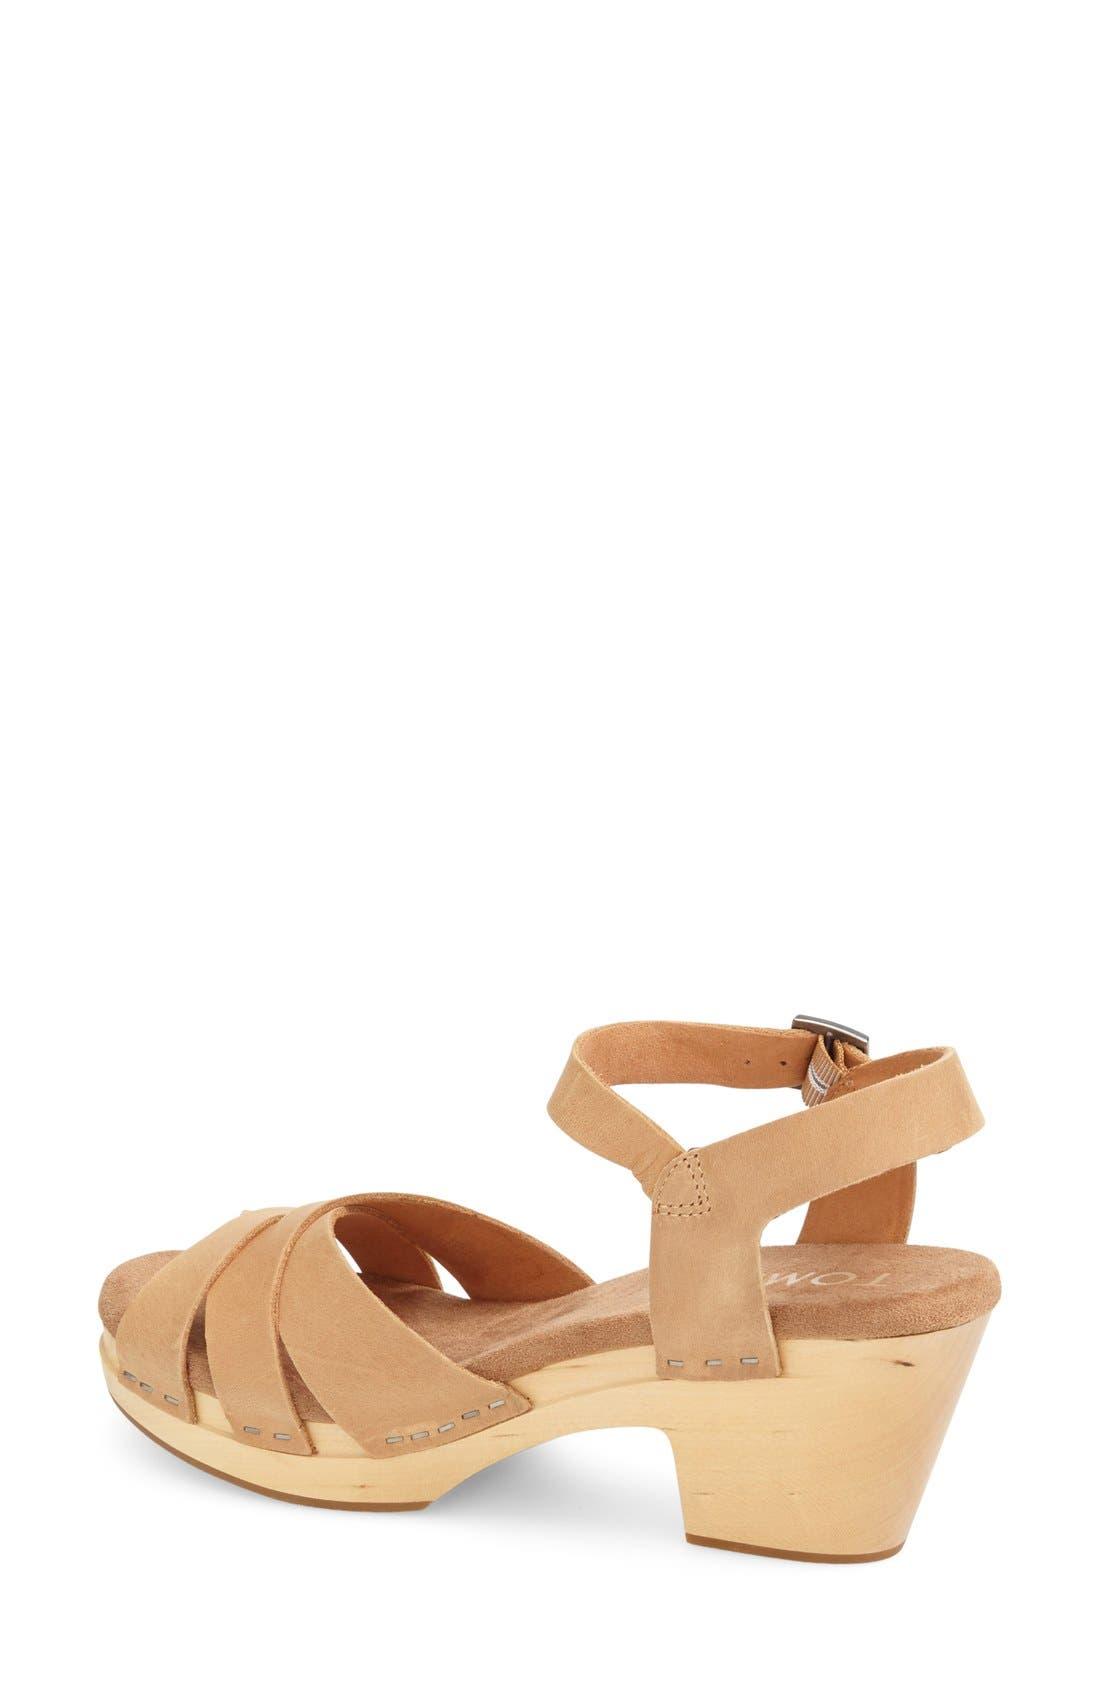 Alternate Image 2  - TOMS 'Beatrix' Leather Sandal (Women)